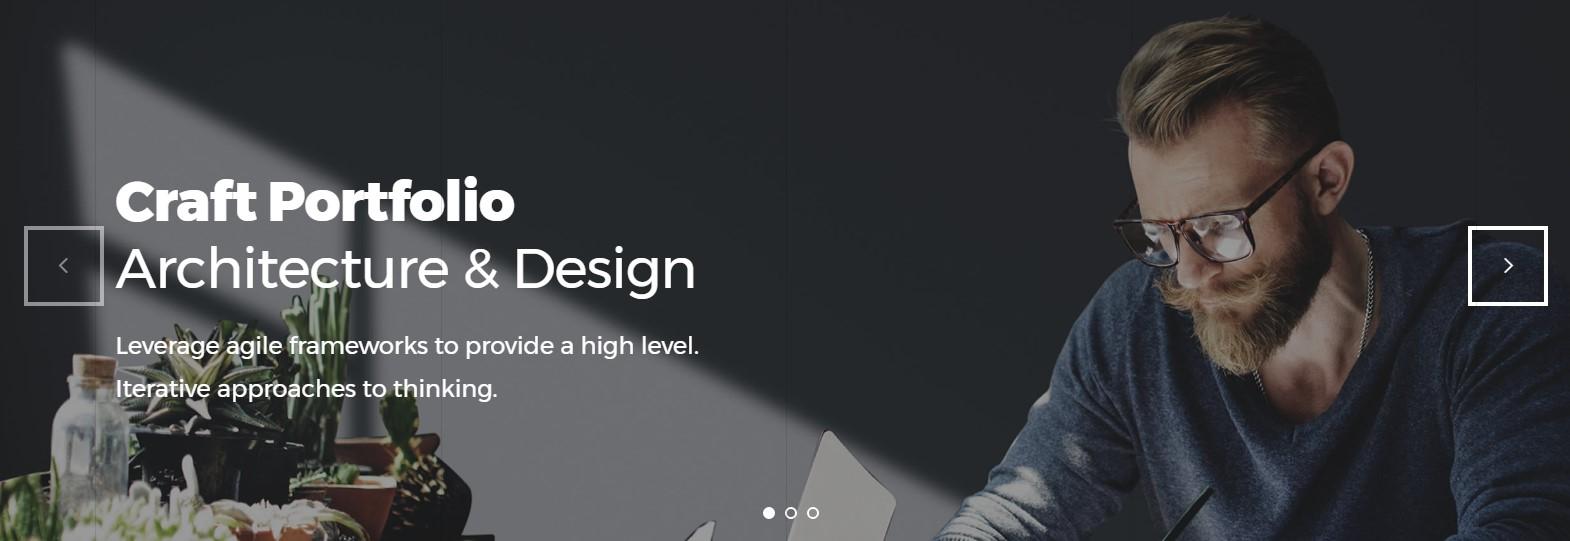 https://documentation.bold-themes.com/craft-portfolio/wp-content/uploads/sites/24/2017/09/slider_f.jpg